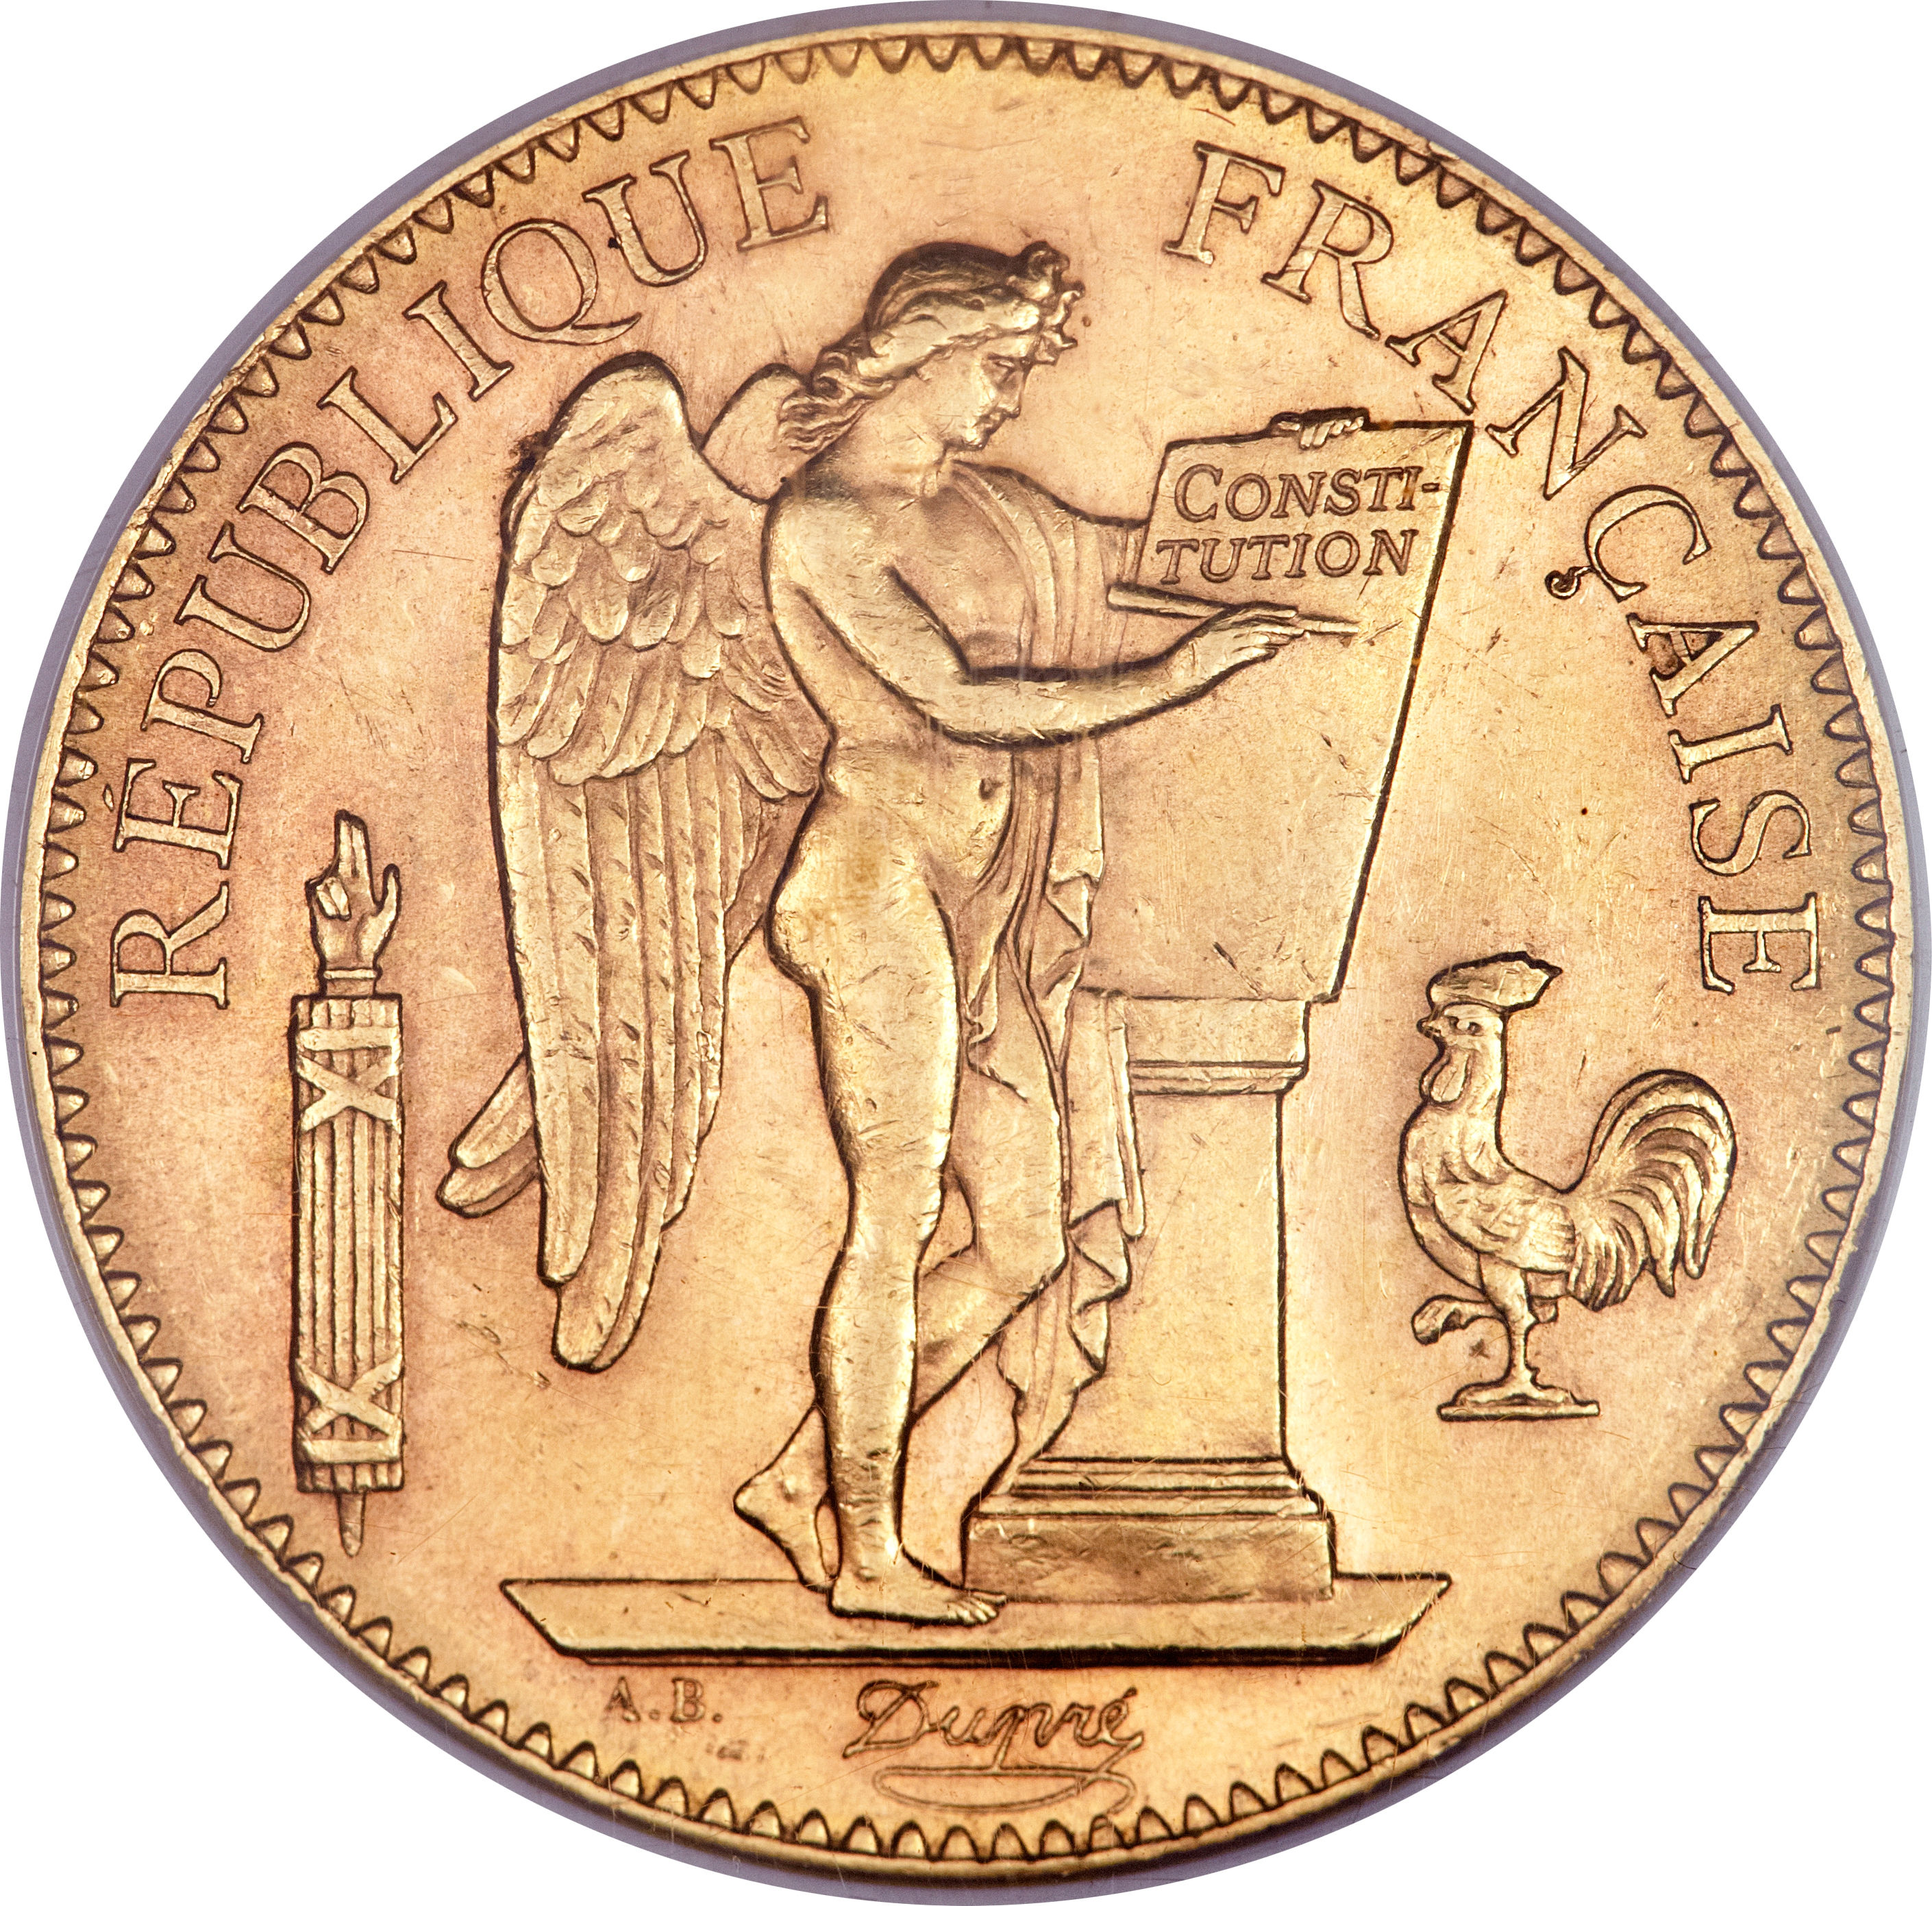 100 francs or g u00e9nie  tranche libert u00e9 egalit u00e9 fraternit u00e9